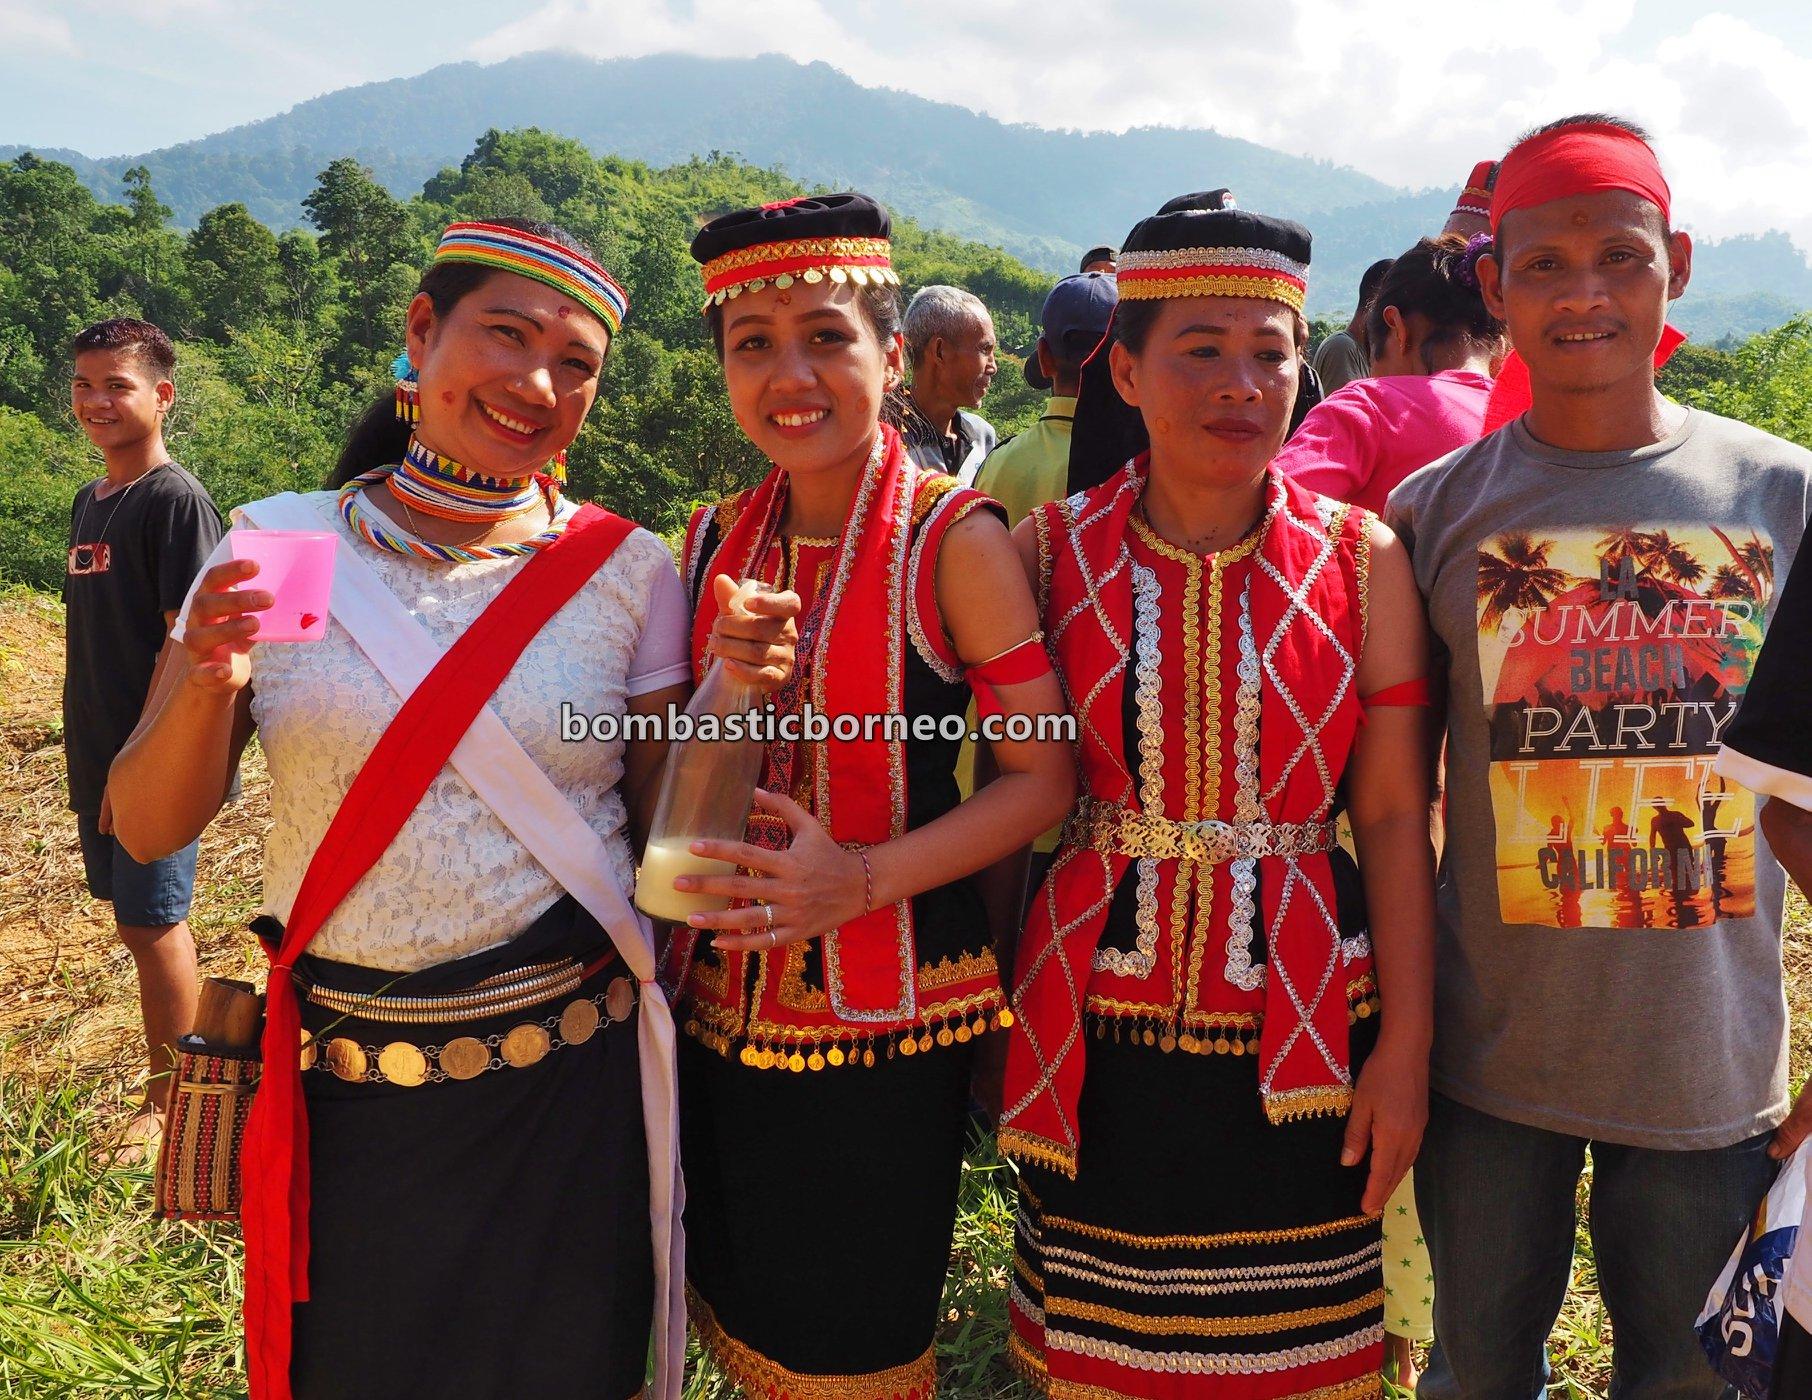 Sungkung Anep, Dusun Medeng, indigenous, destination, Bengkayang, West Kalimantan, Dayak Bidayuh, Ethnic, tribe, village, Tourism, Trans Borneo, 婆罗洲土著部落, 孟加映达雅丰收节日, 原住民传统文化,